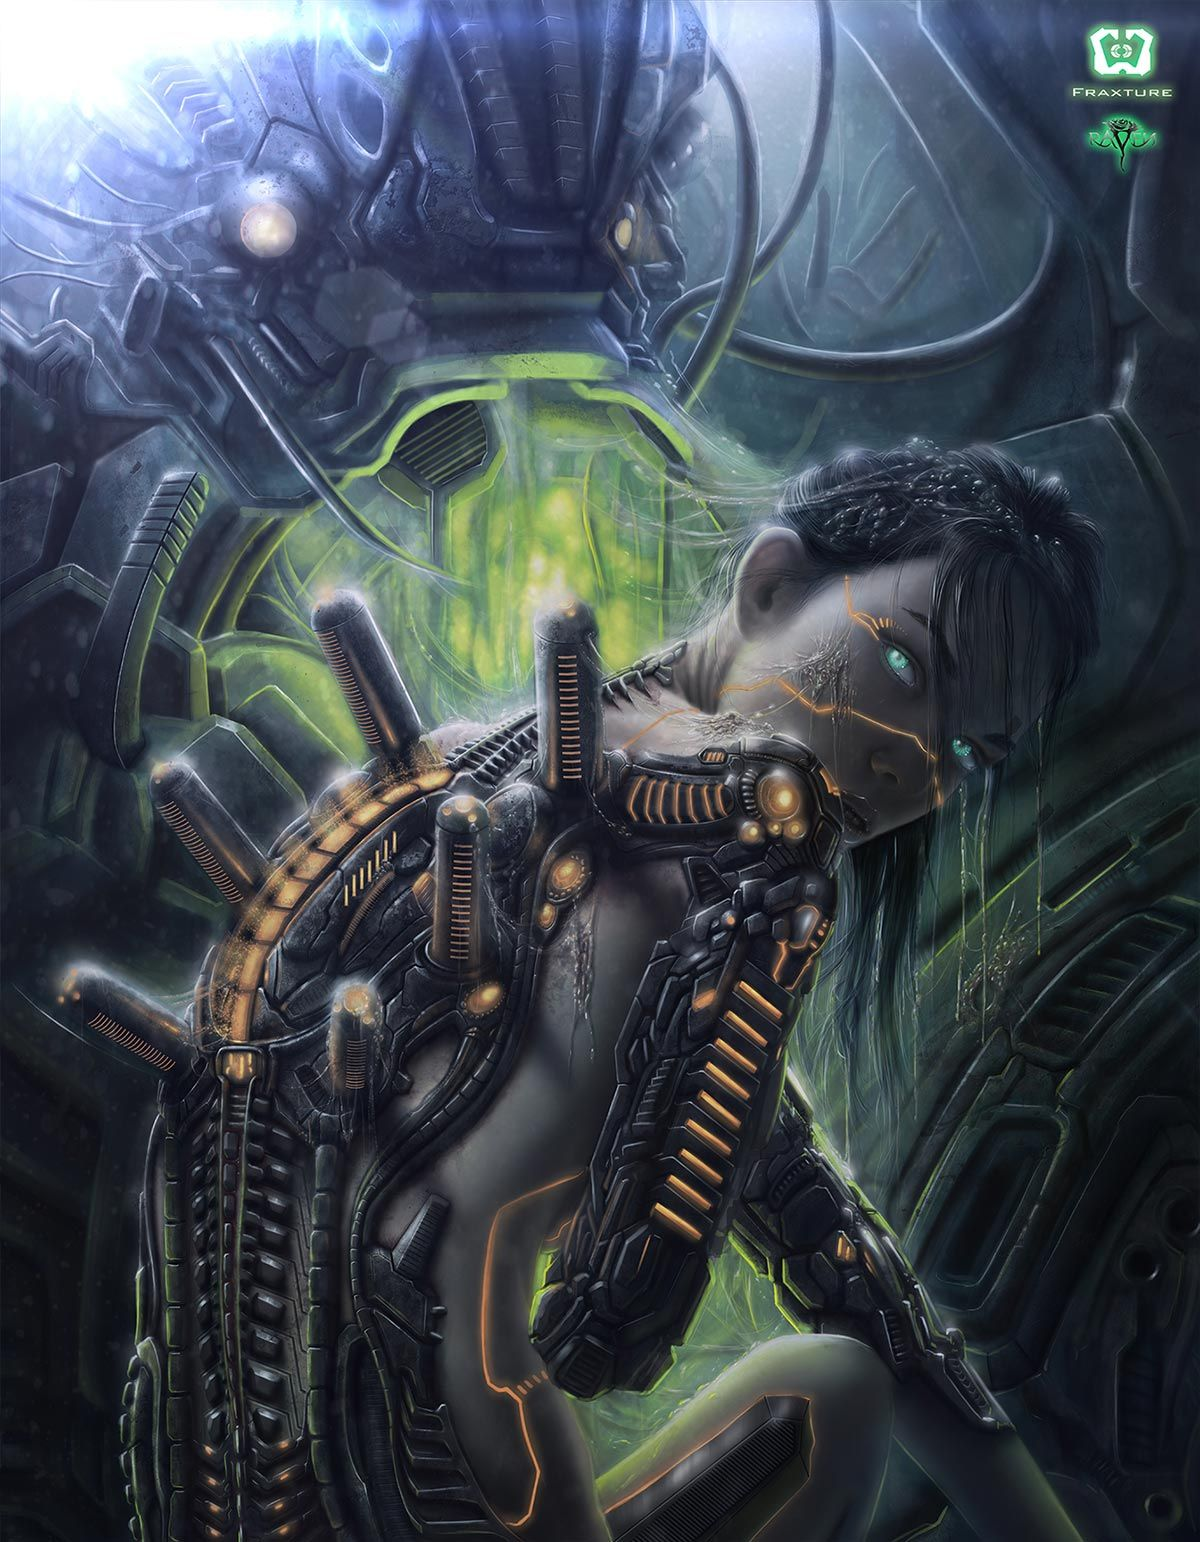 Distorted Perception Sci Fi Fantasy Robot Girl Concept Art